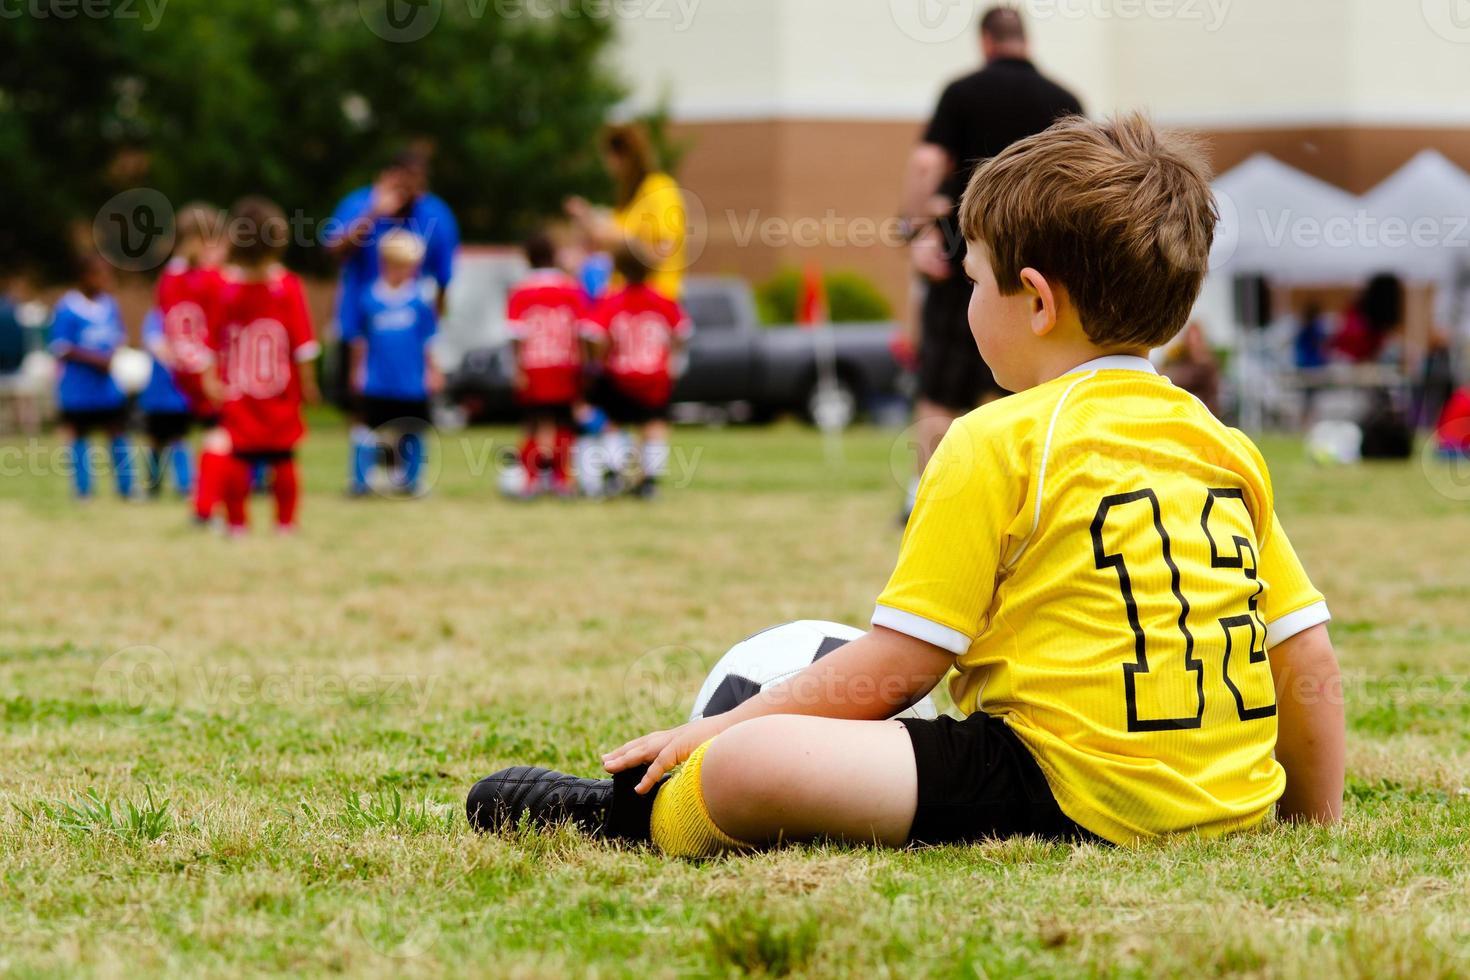 niño en uniforme viendo fútbol juvenil organizado foto